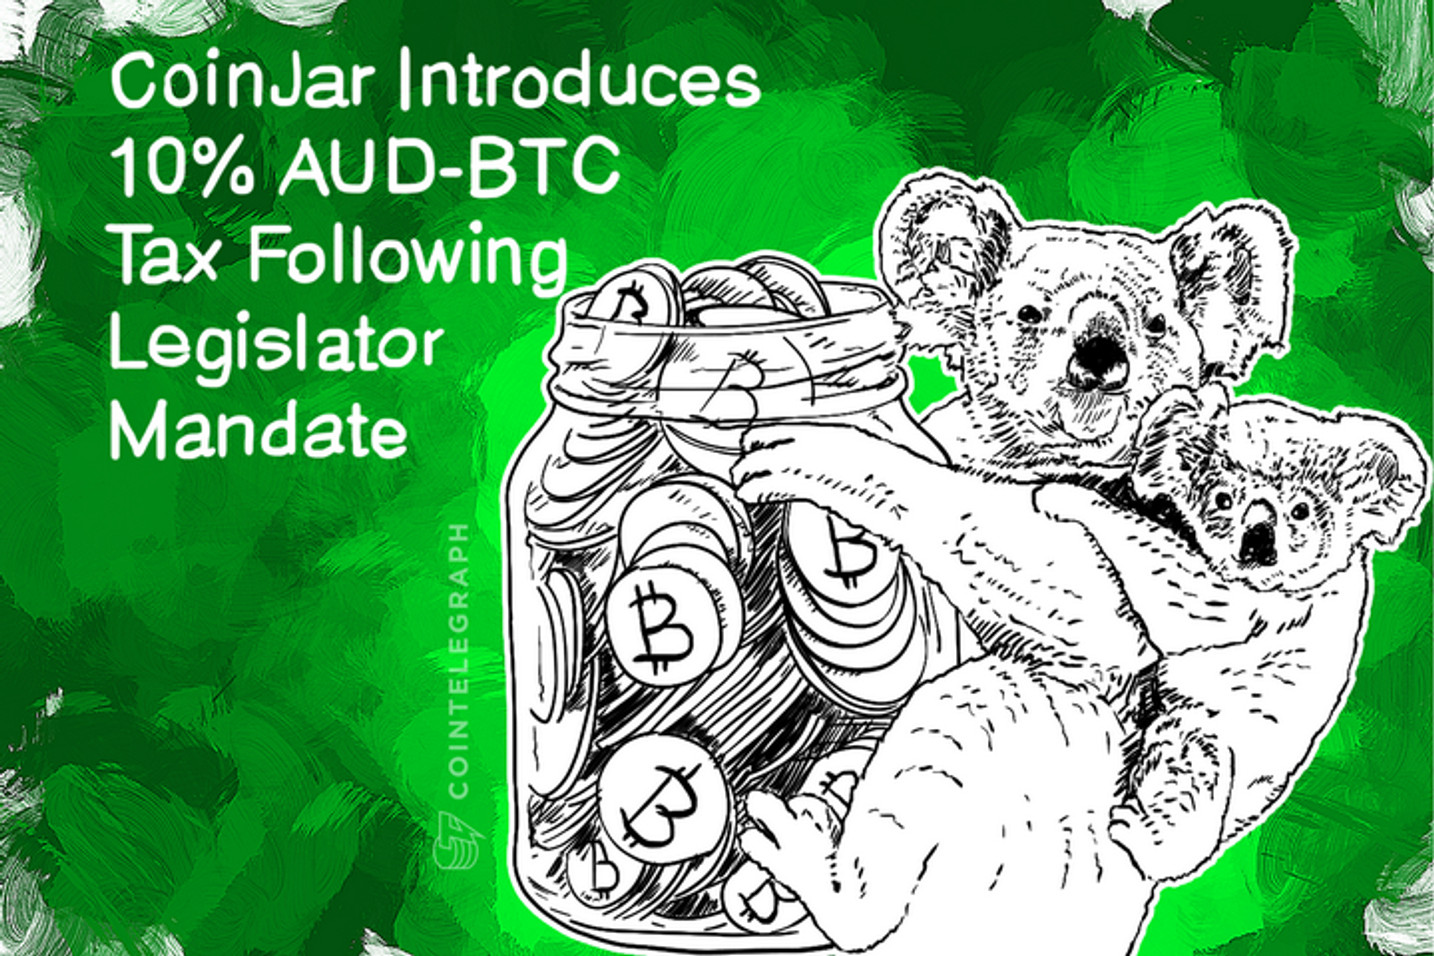 CoinJar Introduces 10% AUD-BTC Tax Following Legislator Mandate